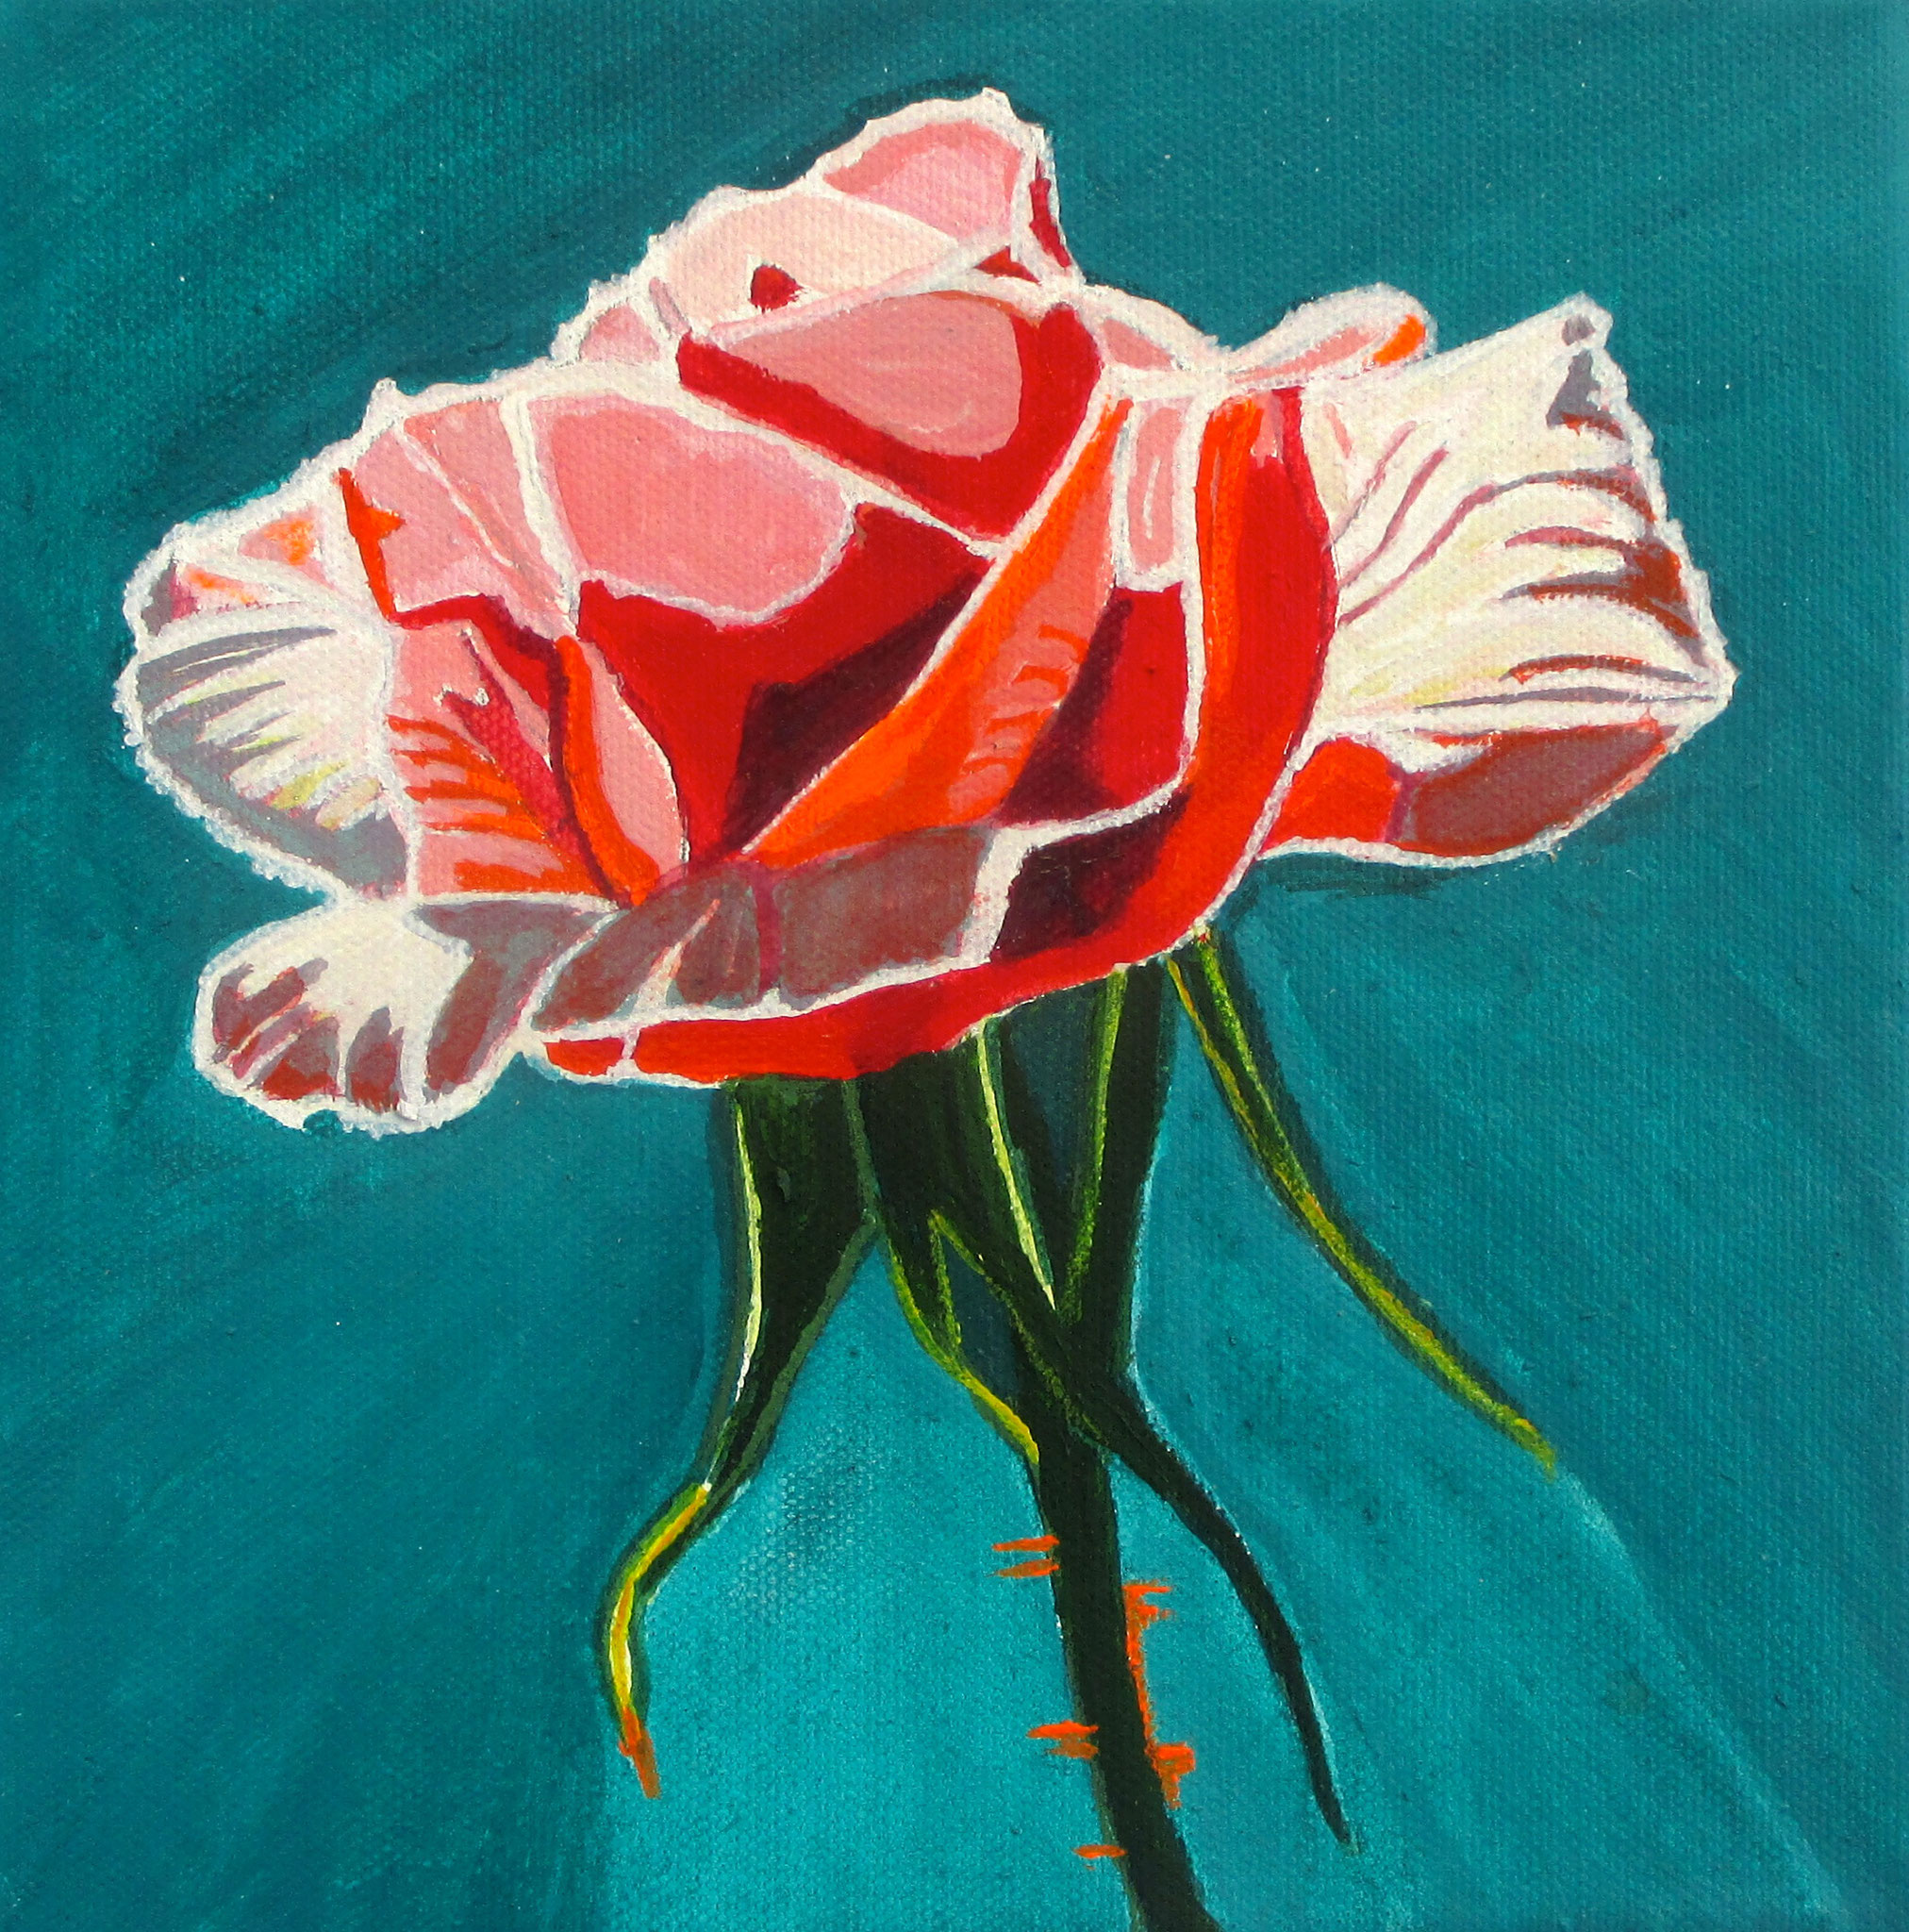 Venus Rose, acrylic on canvas, 8 x 8